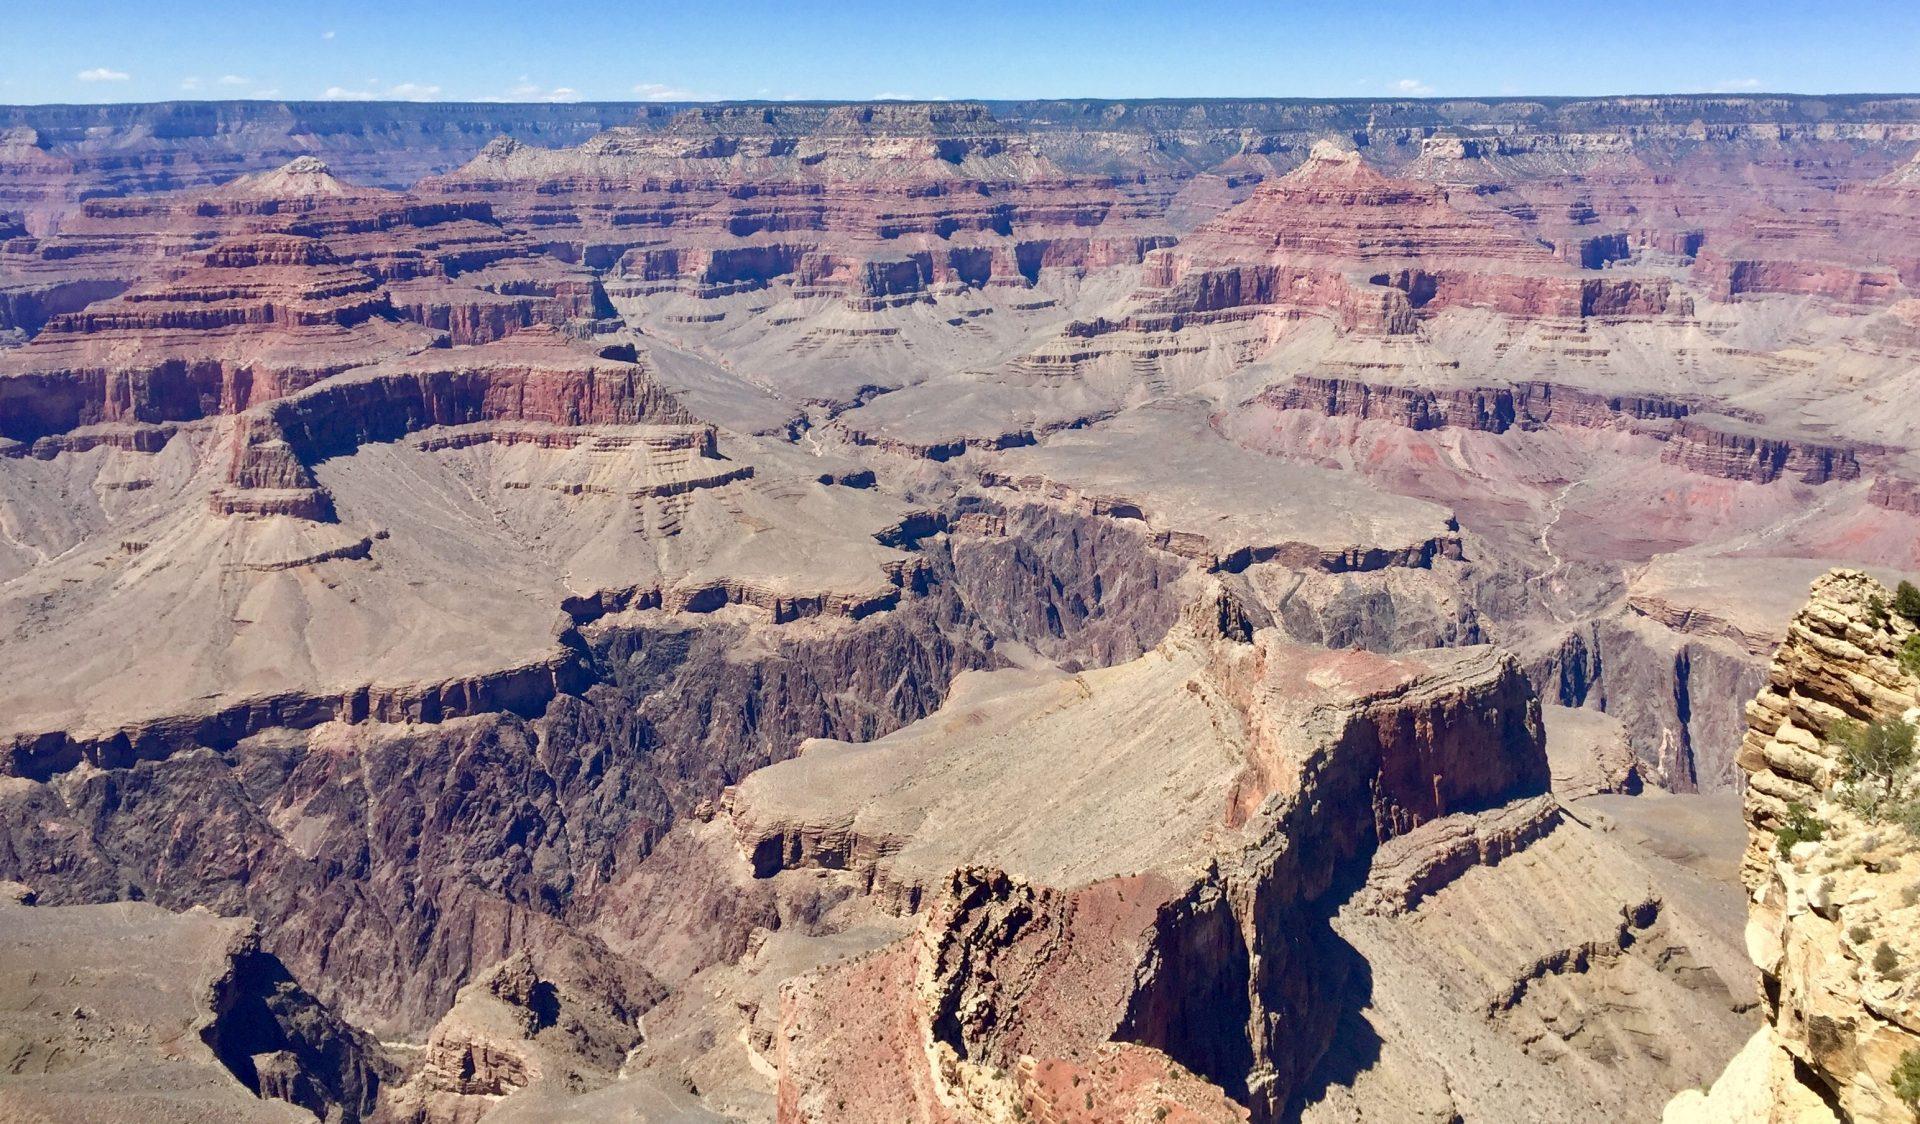 Arizona Part 3 – May 25 to 30